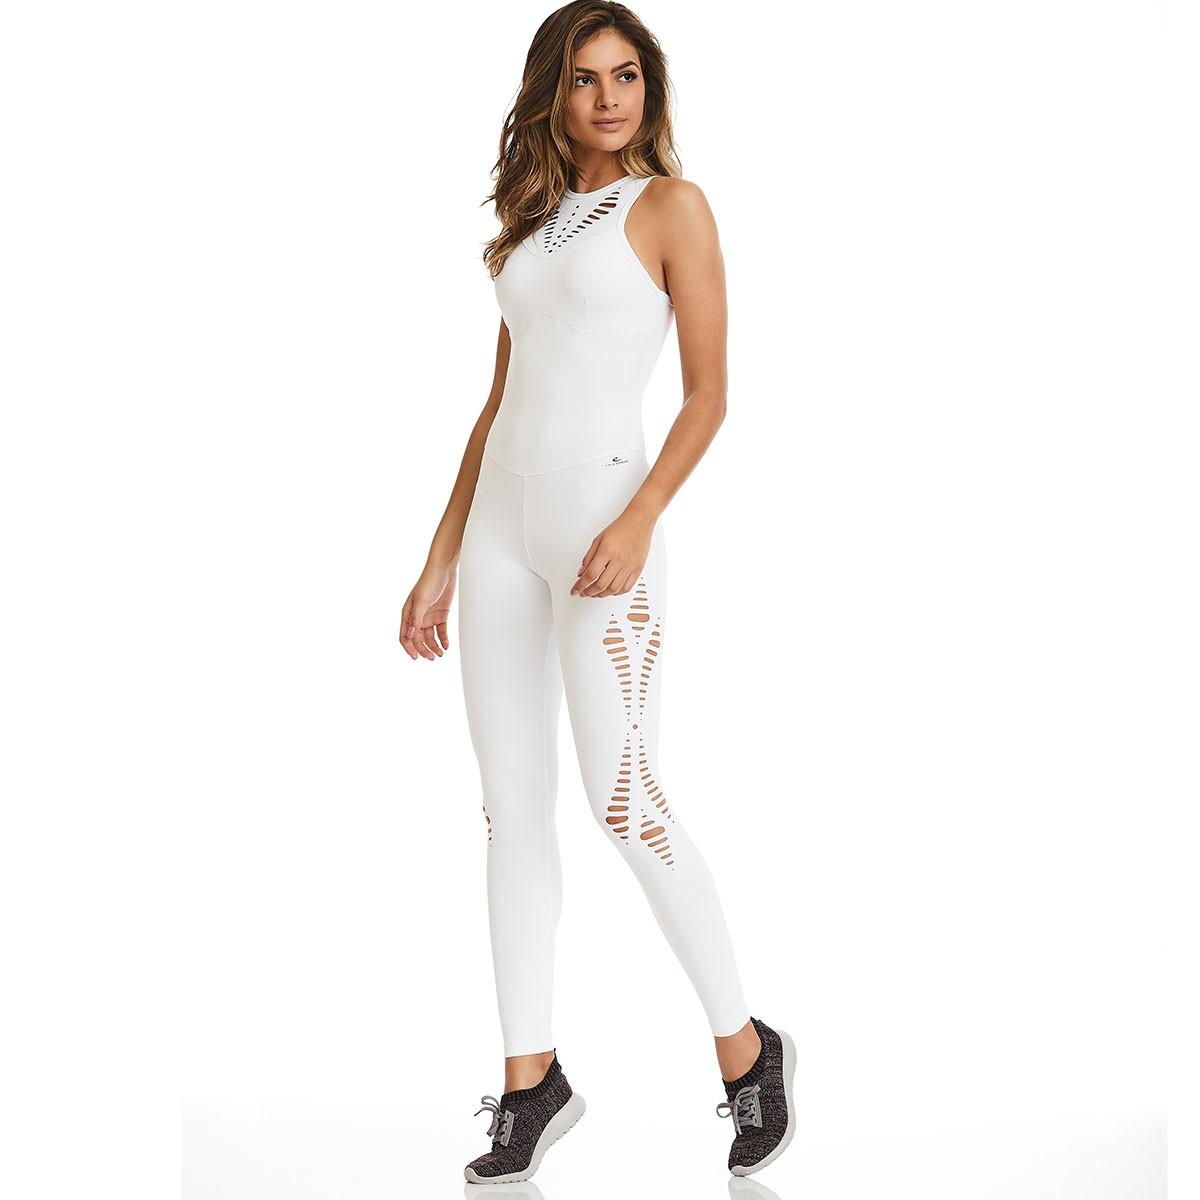 Macacão NZ Laser Classic Branco CAJUBRASIL Activewear